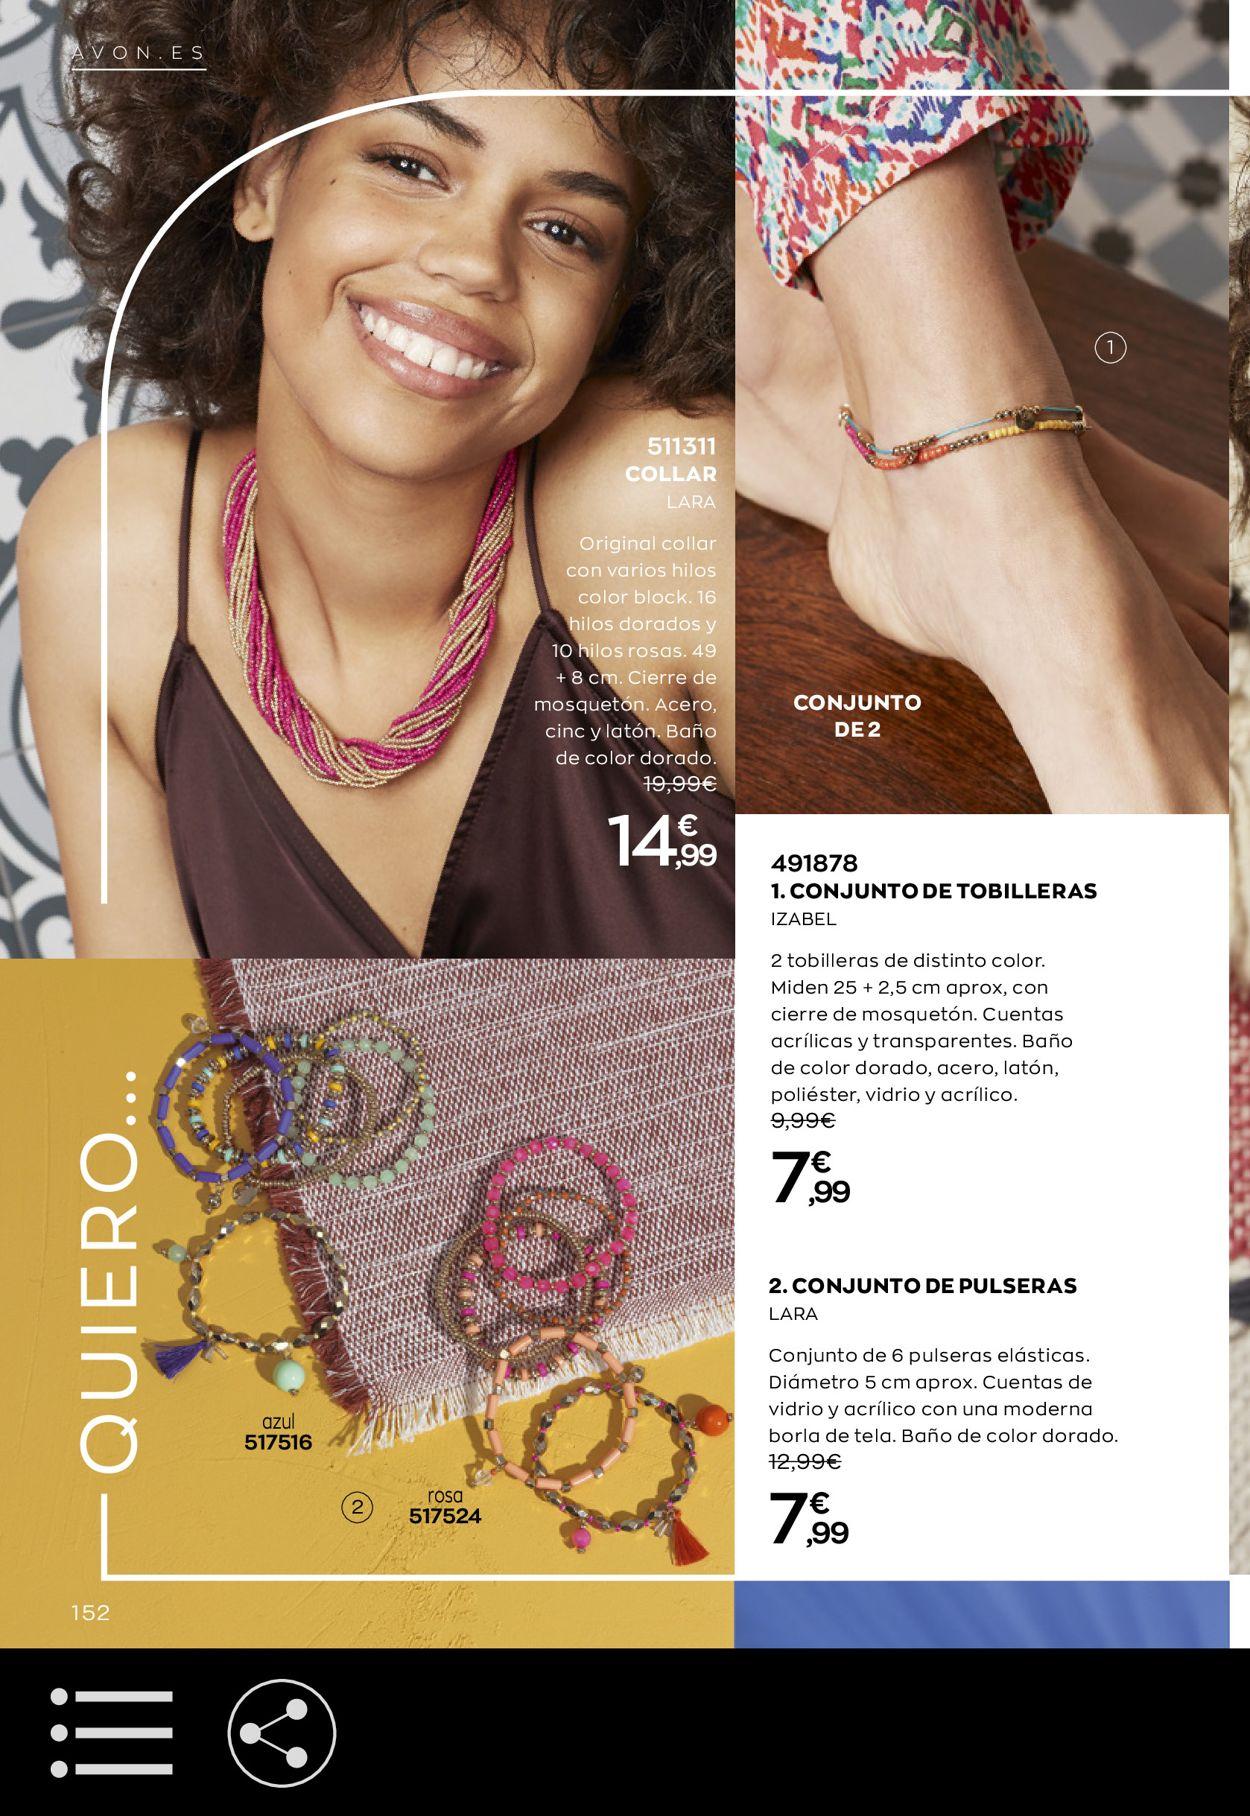 Avon Folleto - 12.09-01.10.2020 (Página 152)